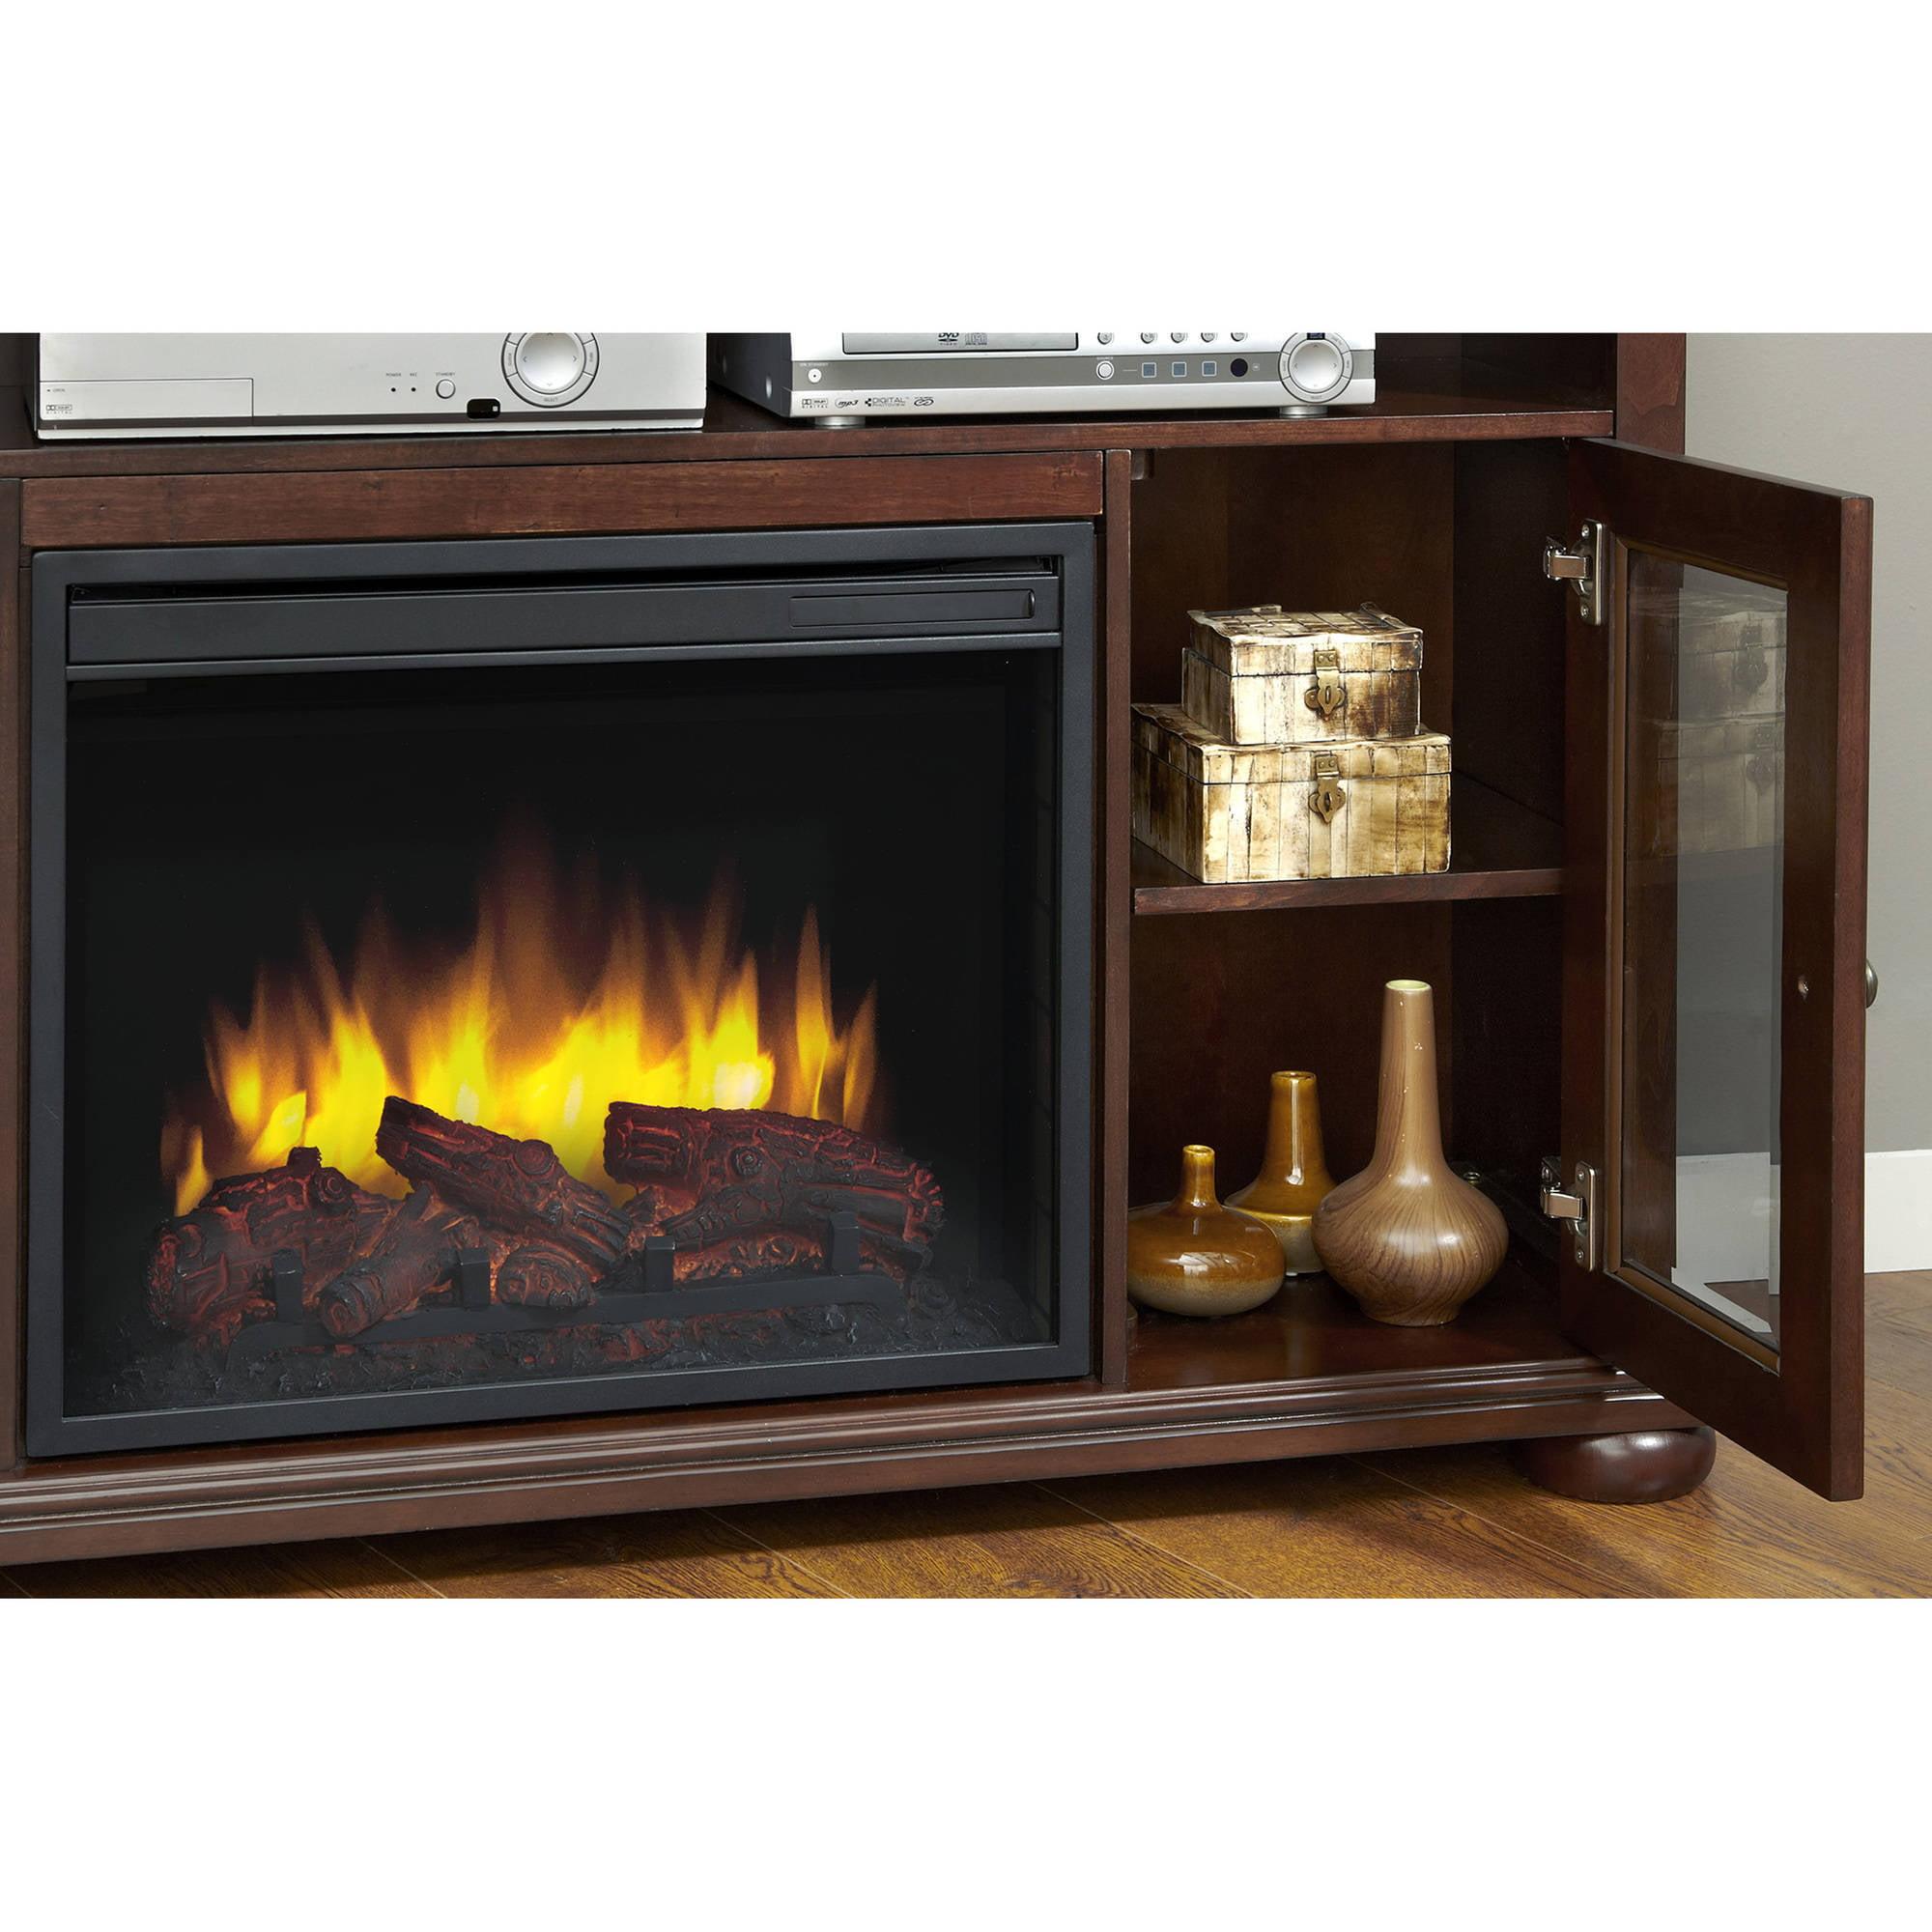 pleasant hearth 238 11 68 everest media fireplace walmart com